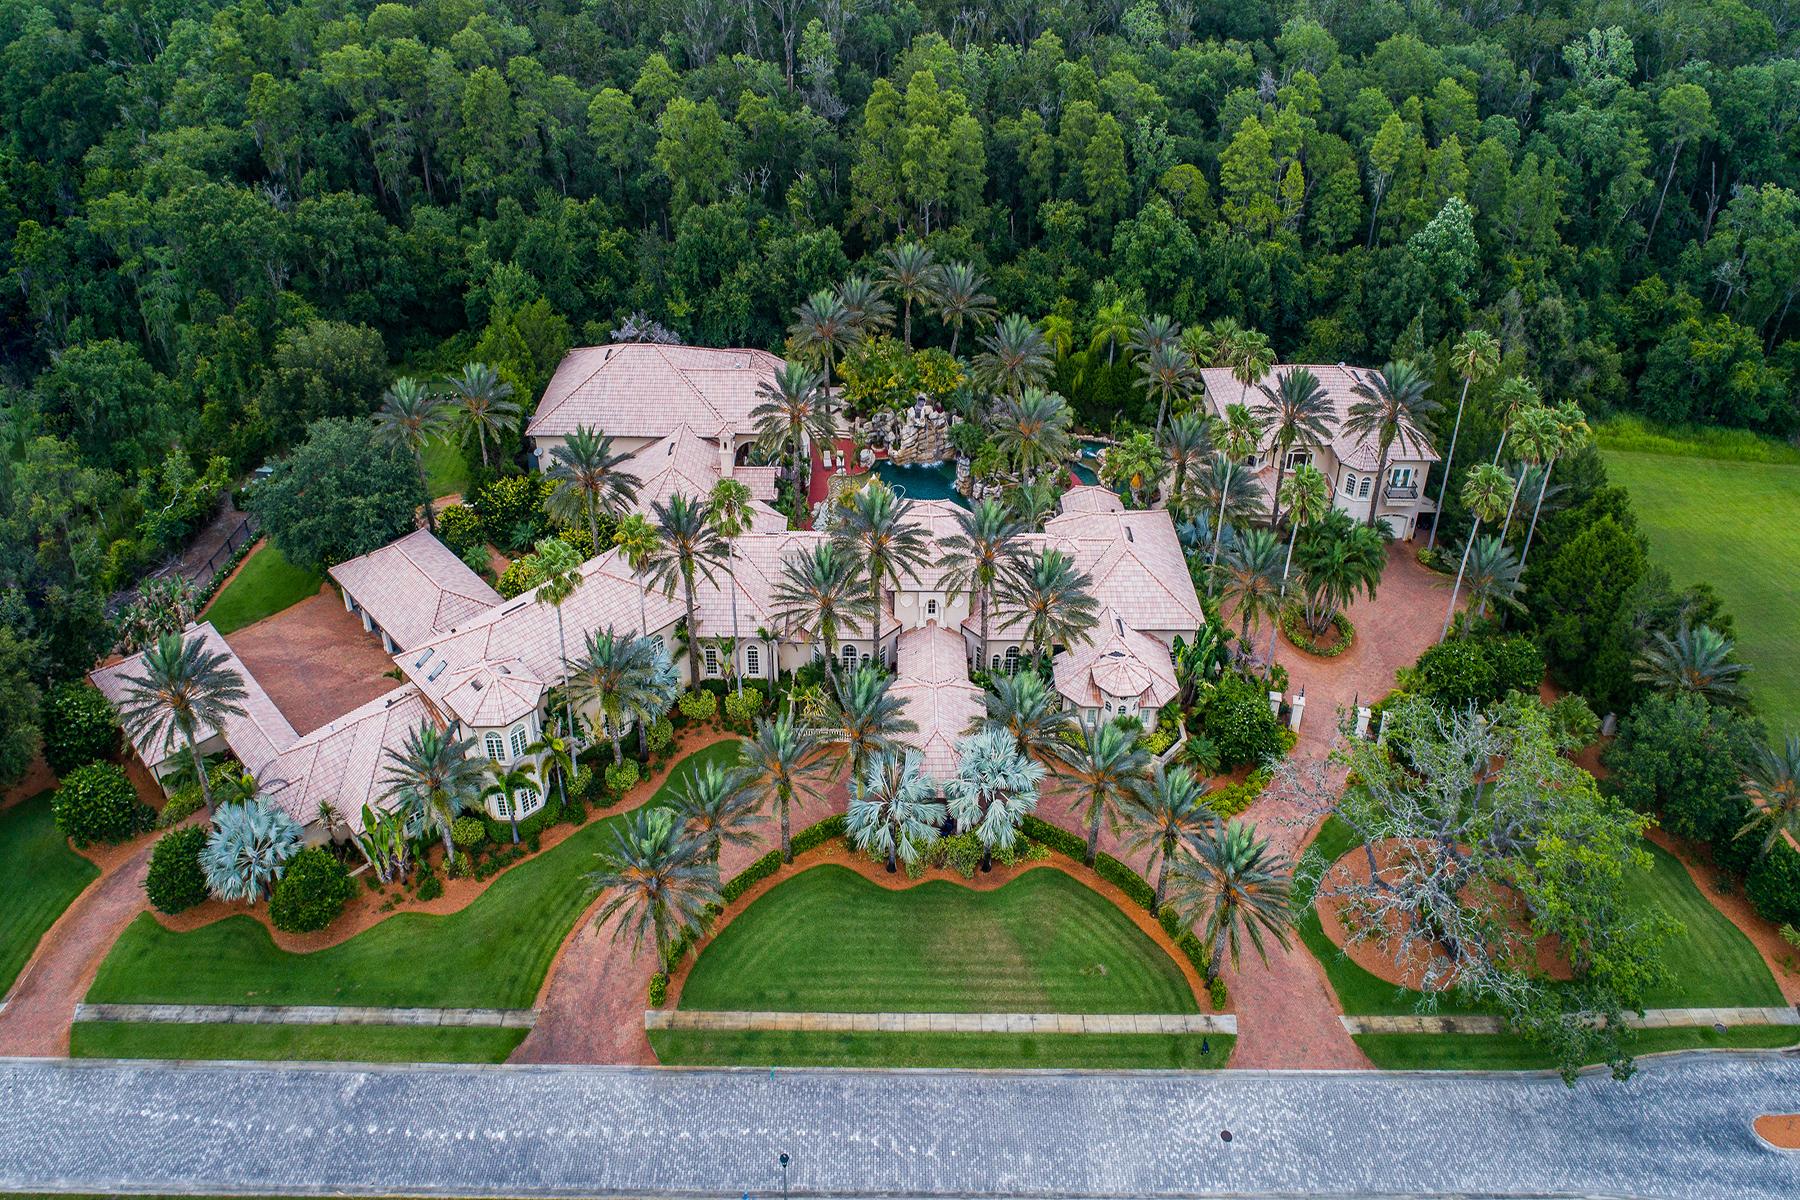 Single Family Homes for Sale at 3255 Buffalo Run Tarpon Springs, Florida 34688 United States